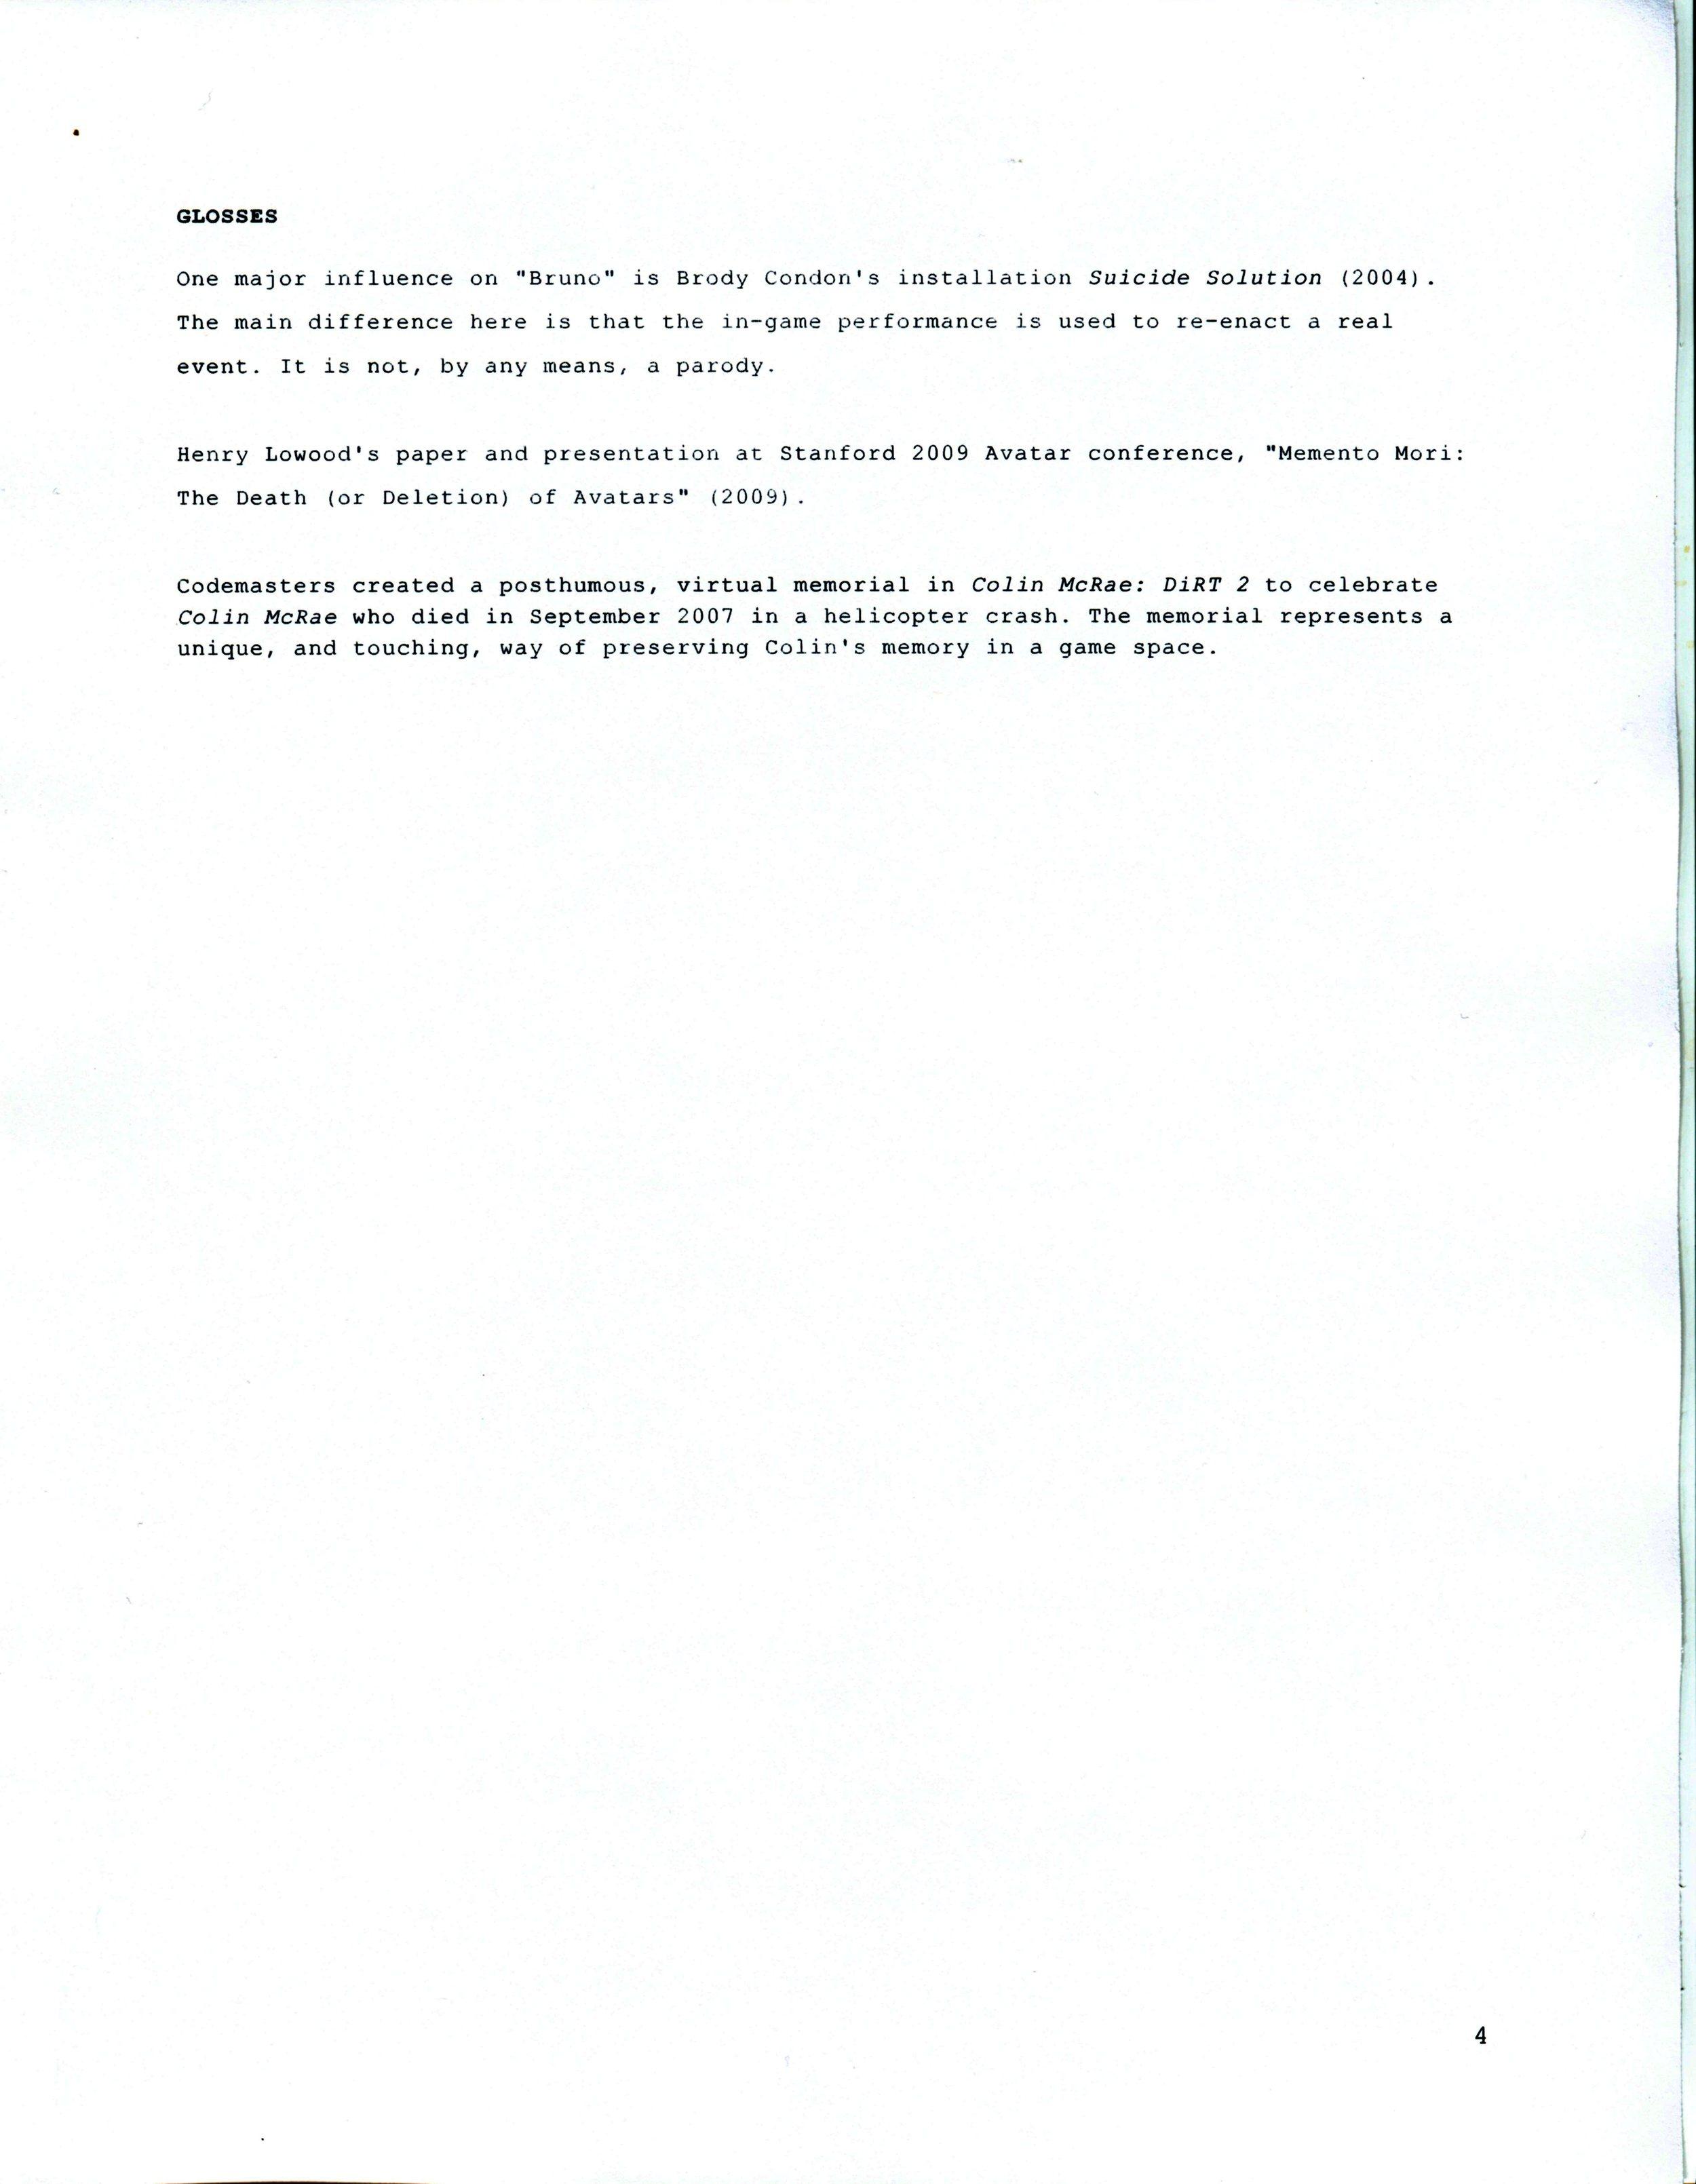 bruno 4.jpg